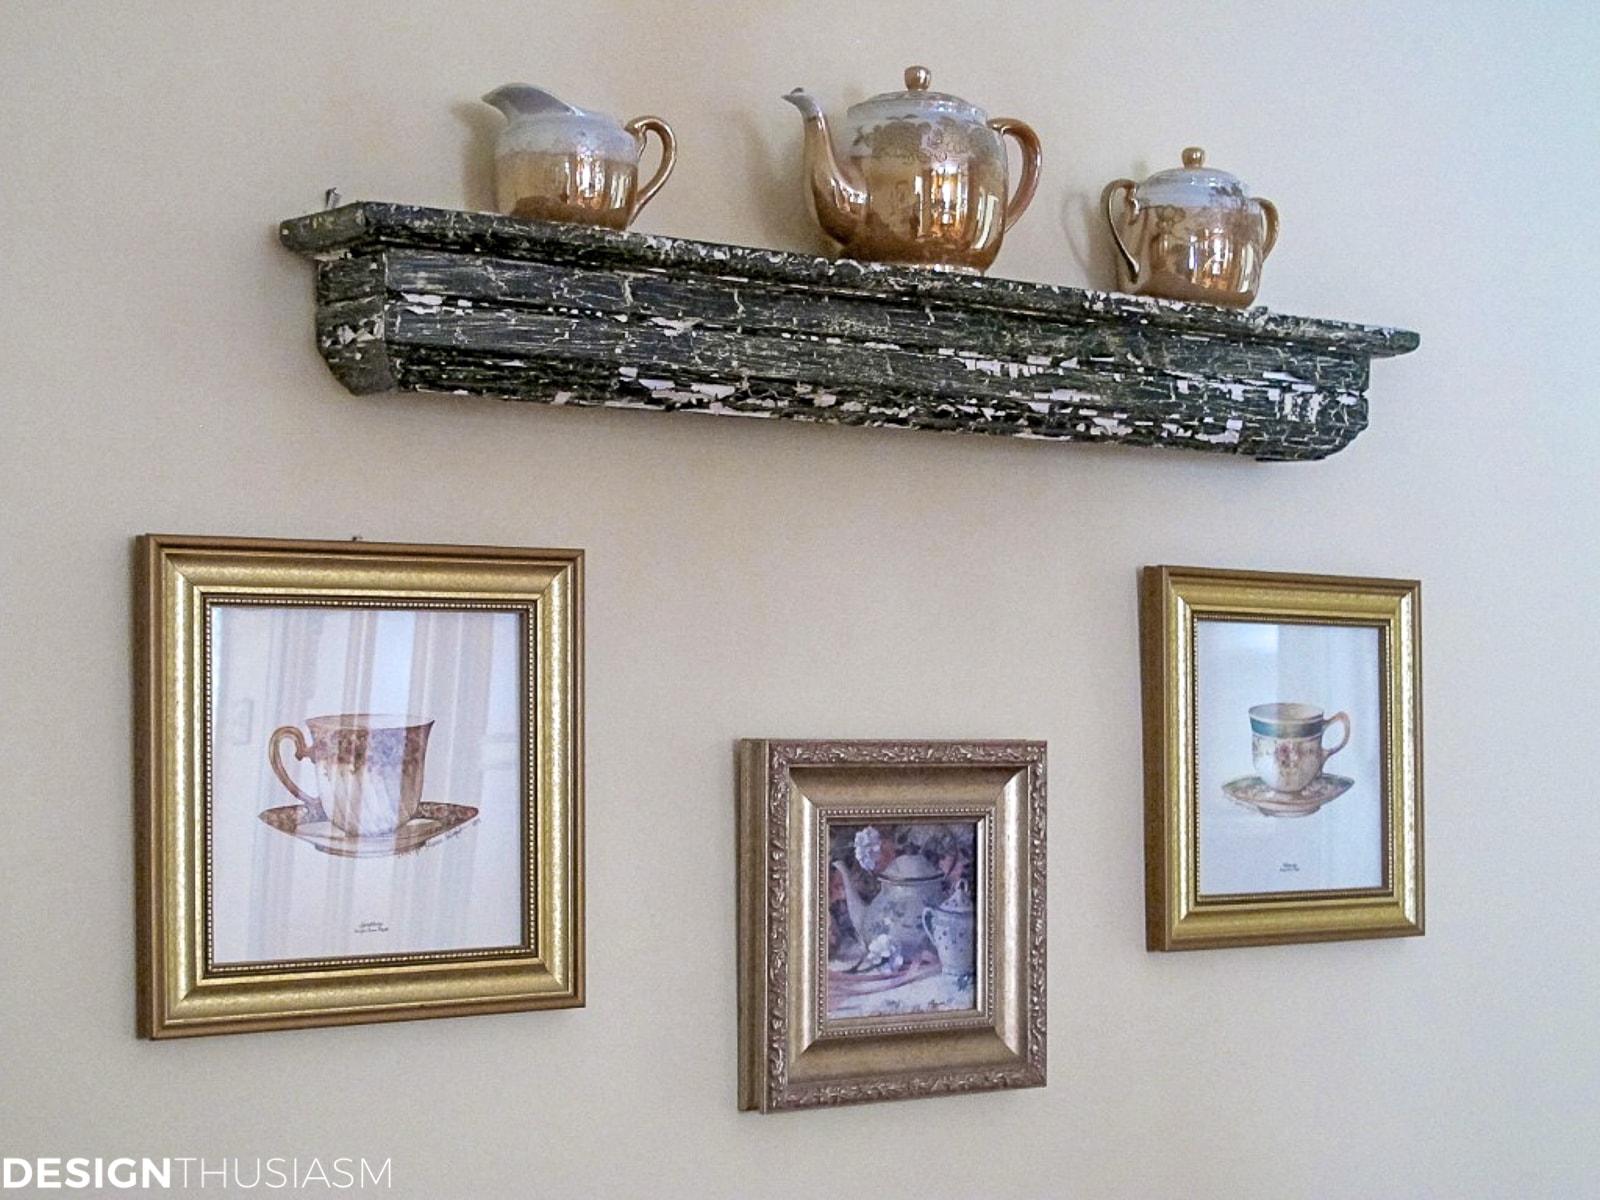 vintage teacups and saucers displayed on a shelf